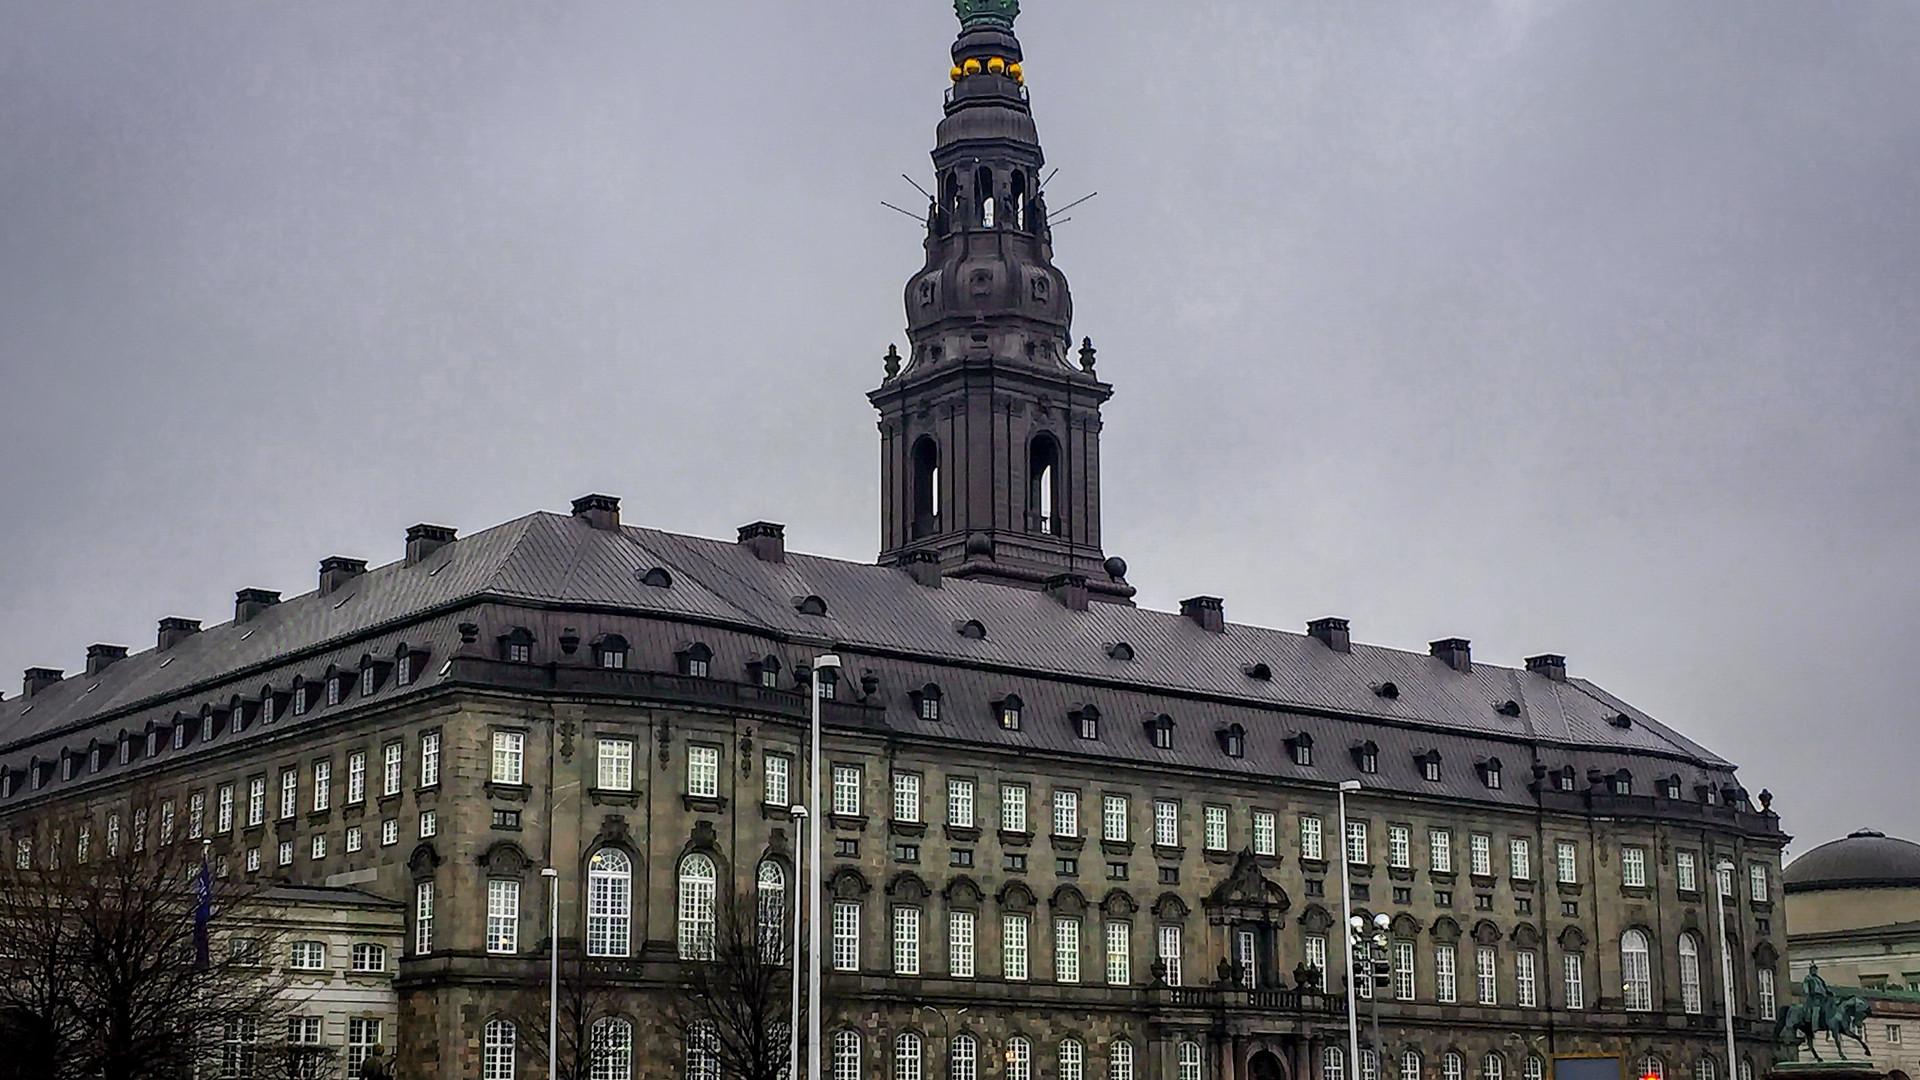 Замок Кристиансборг, Копенгаген